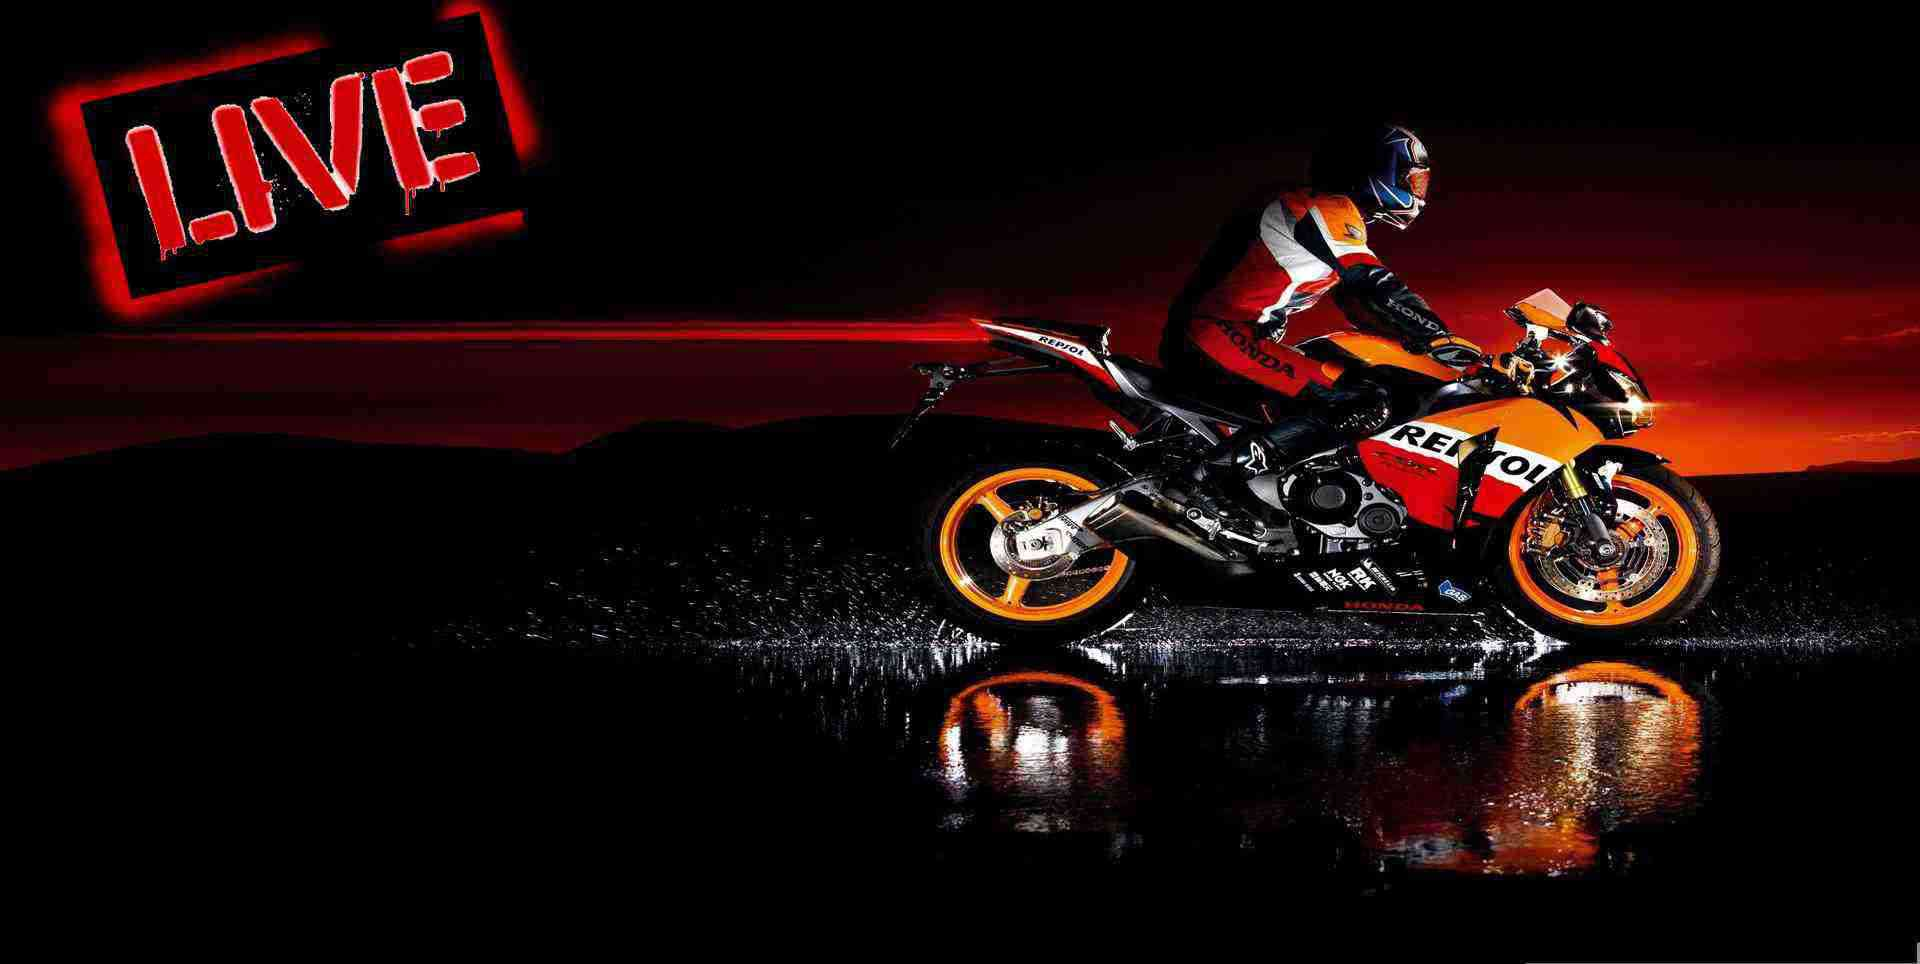 motogp-red-bull-indianapolis-grand-prix-live